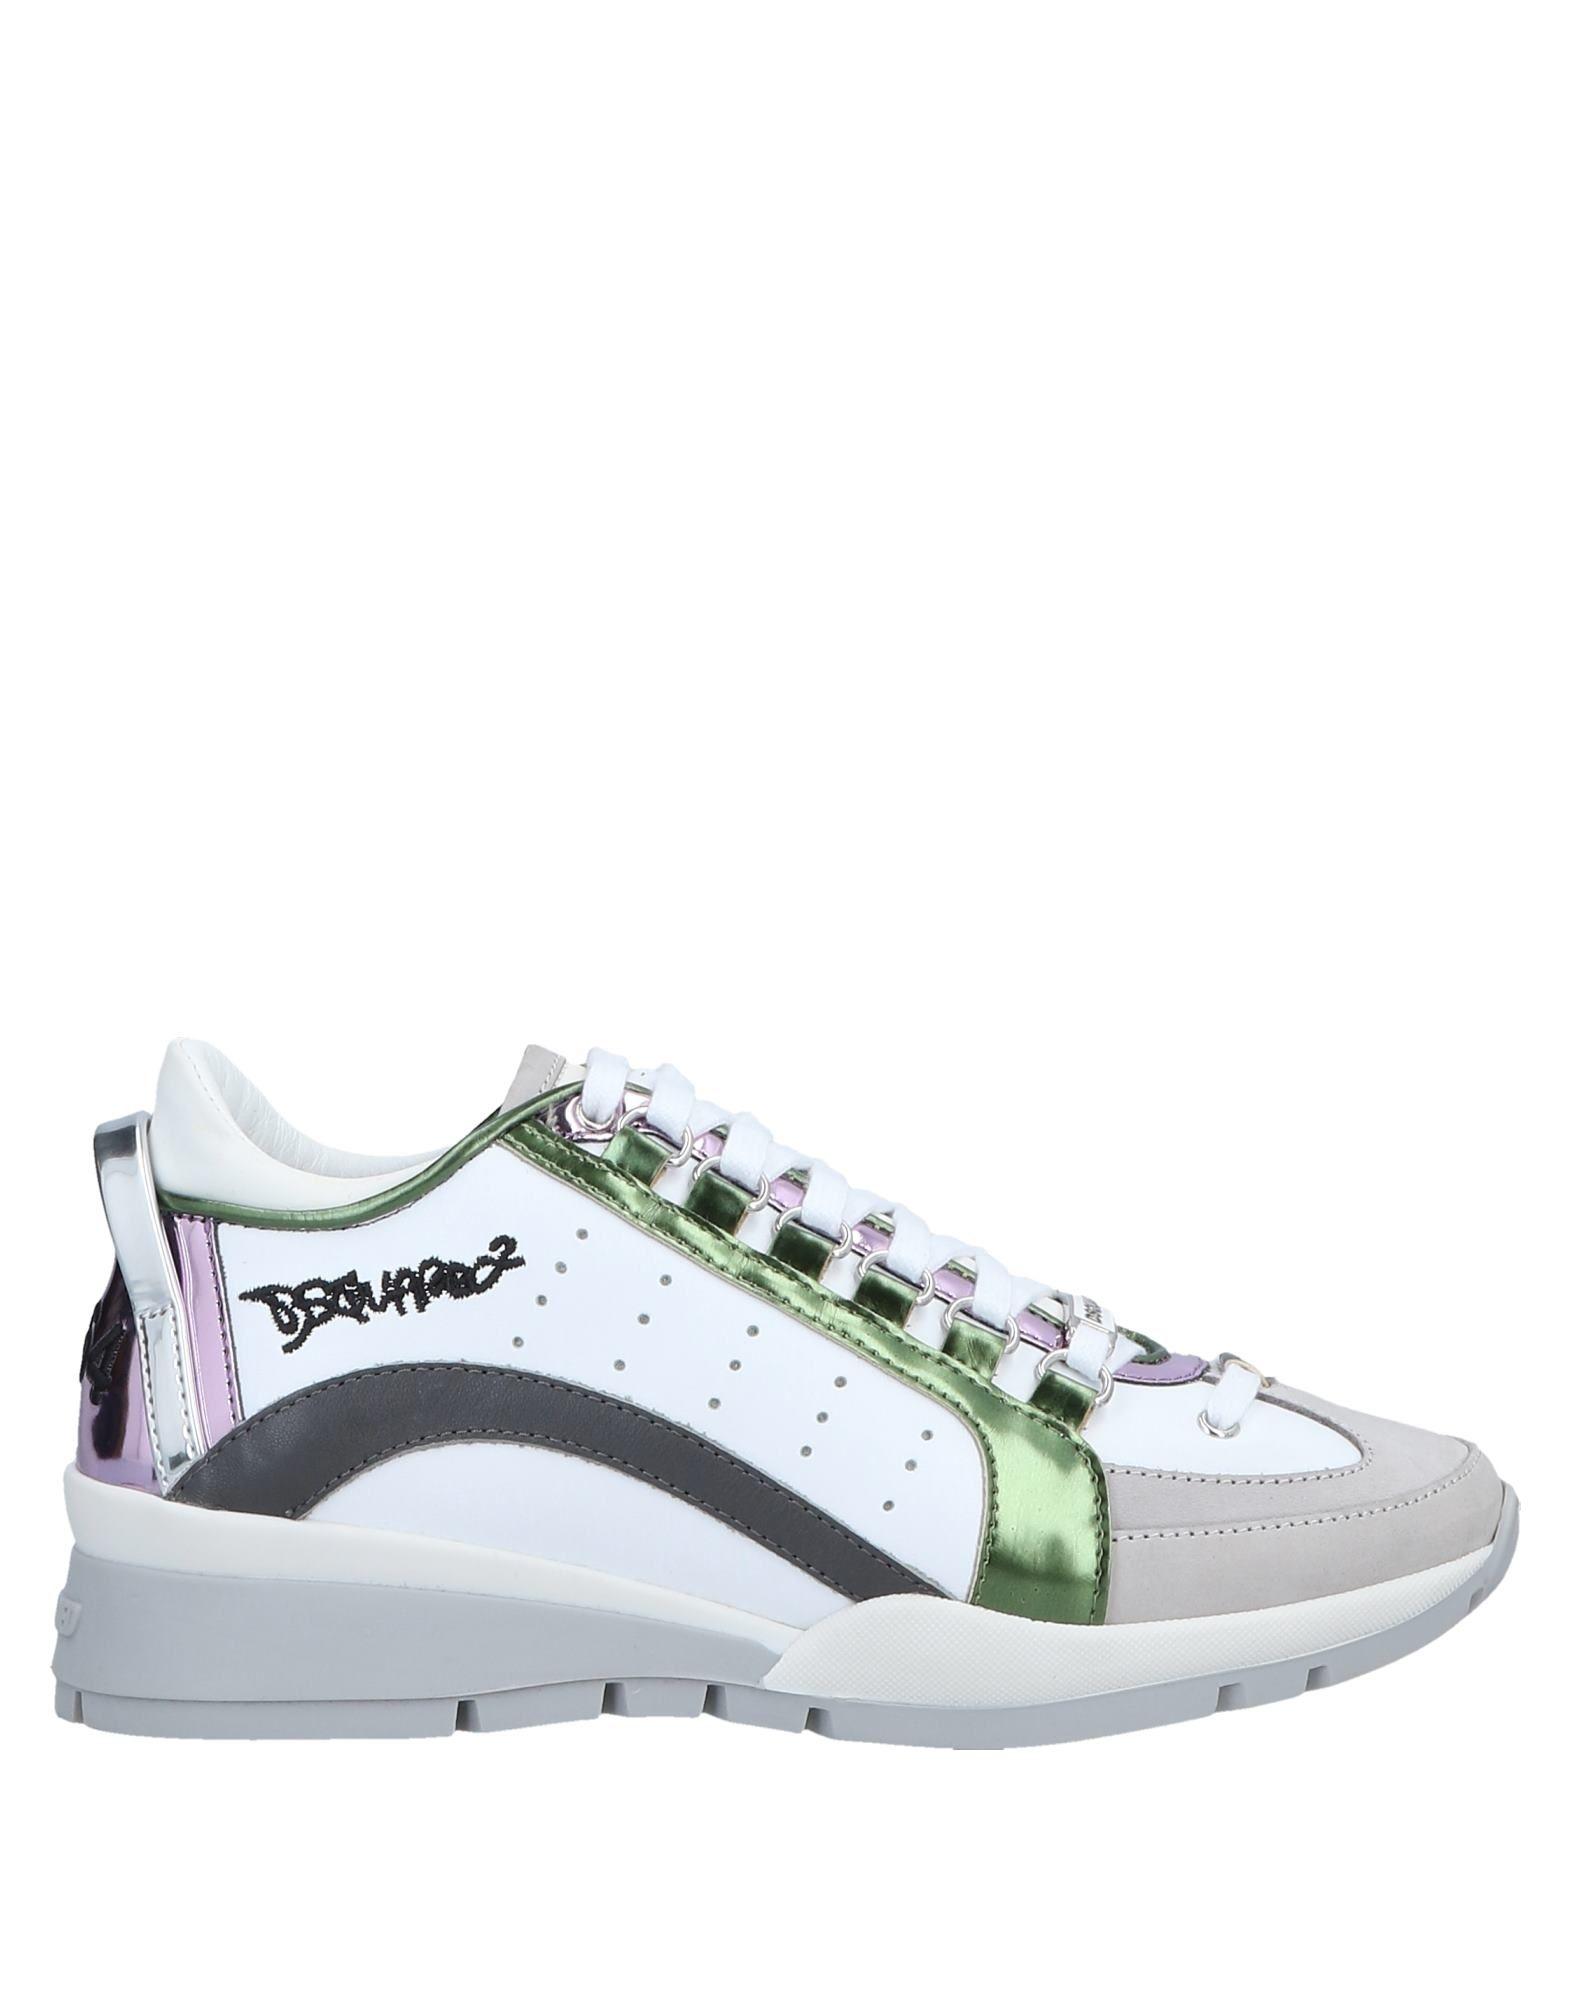 Sneakers Dsquared2 Donna - 11555907NM elegante